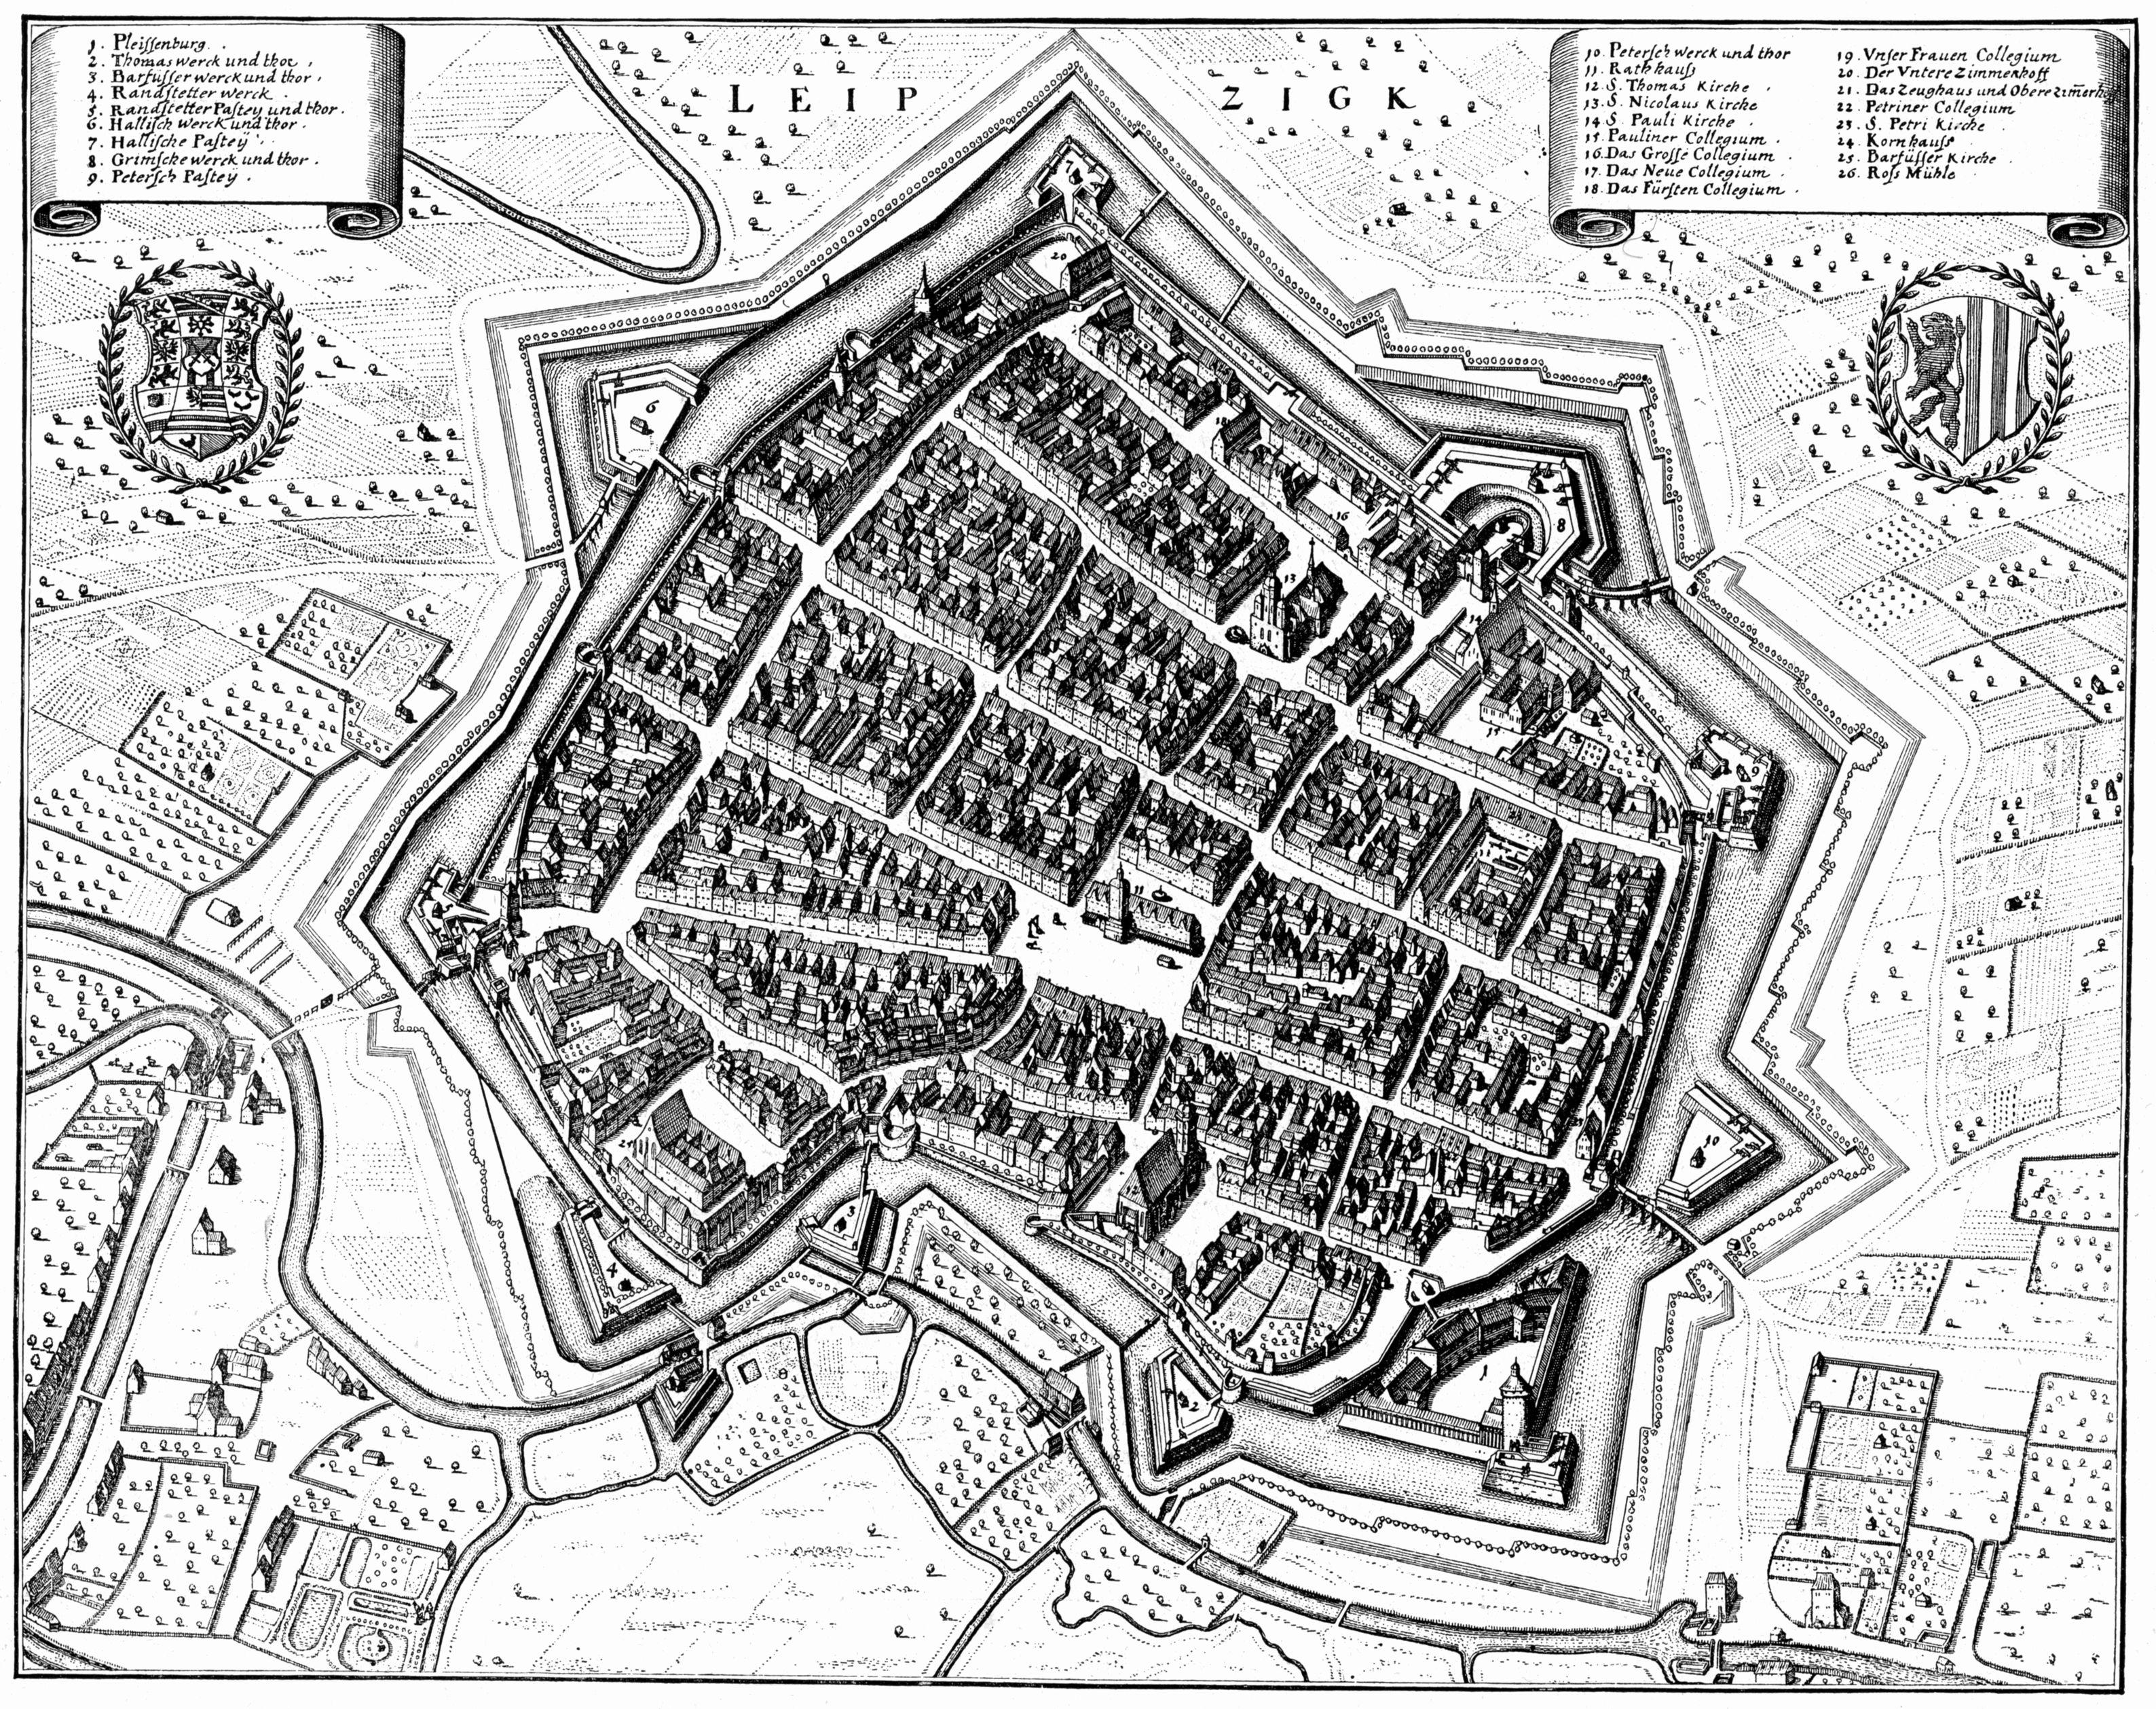 File:Leipzig-1650-Merian.jpg - Wikimedia Commons